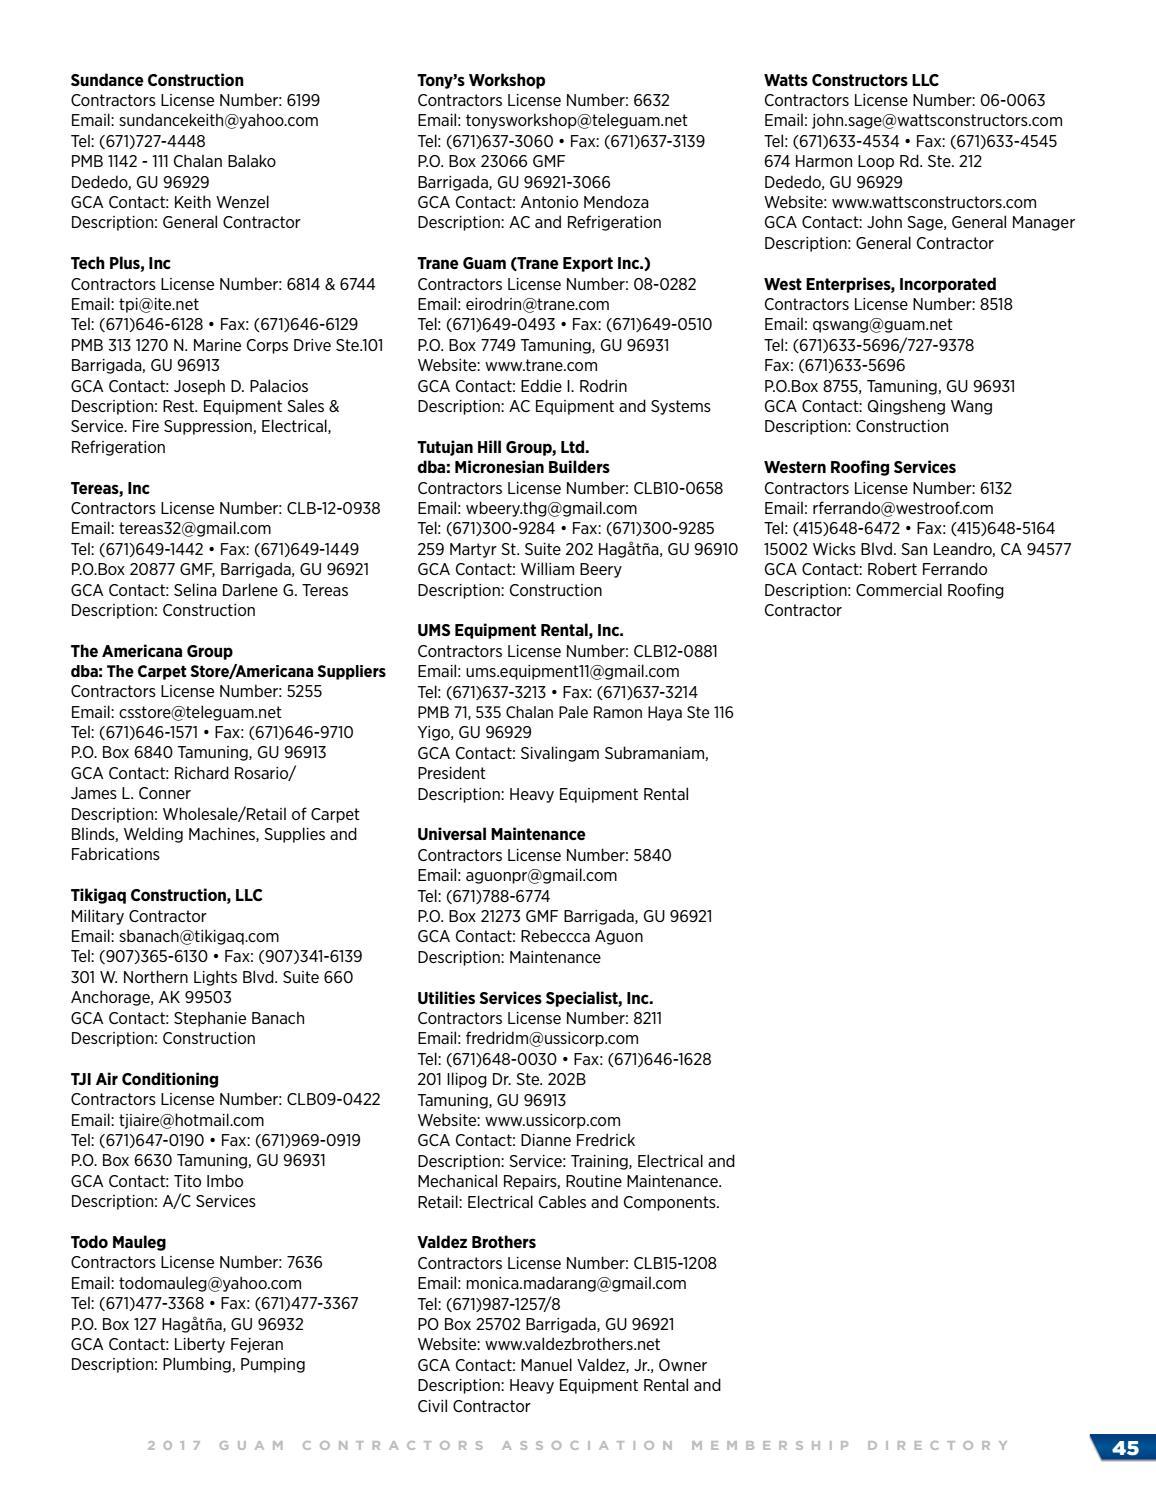 Gca 2017 Membership Directory By Geri Leon Guerrero Issuu